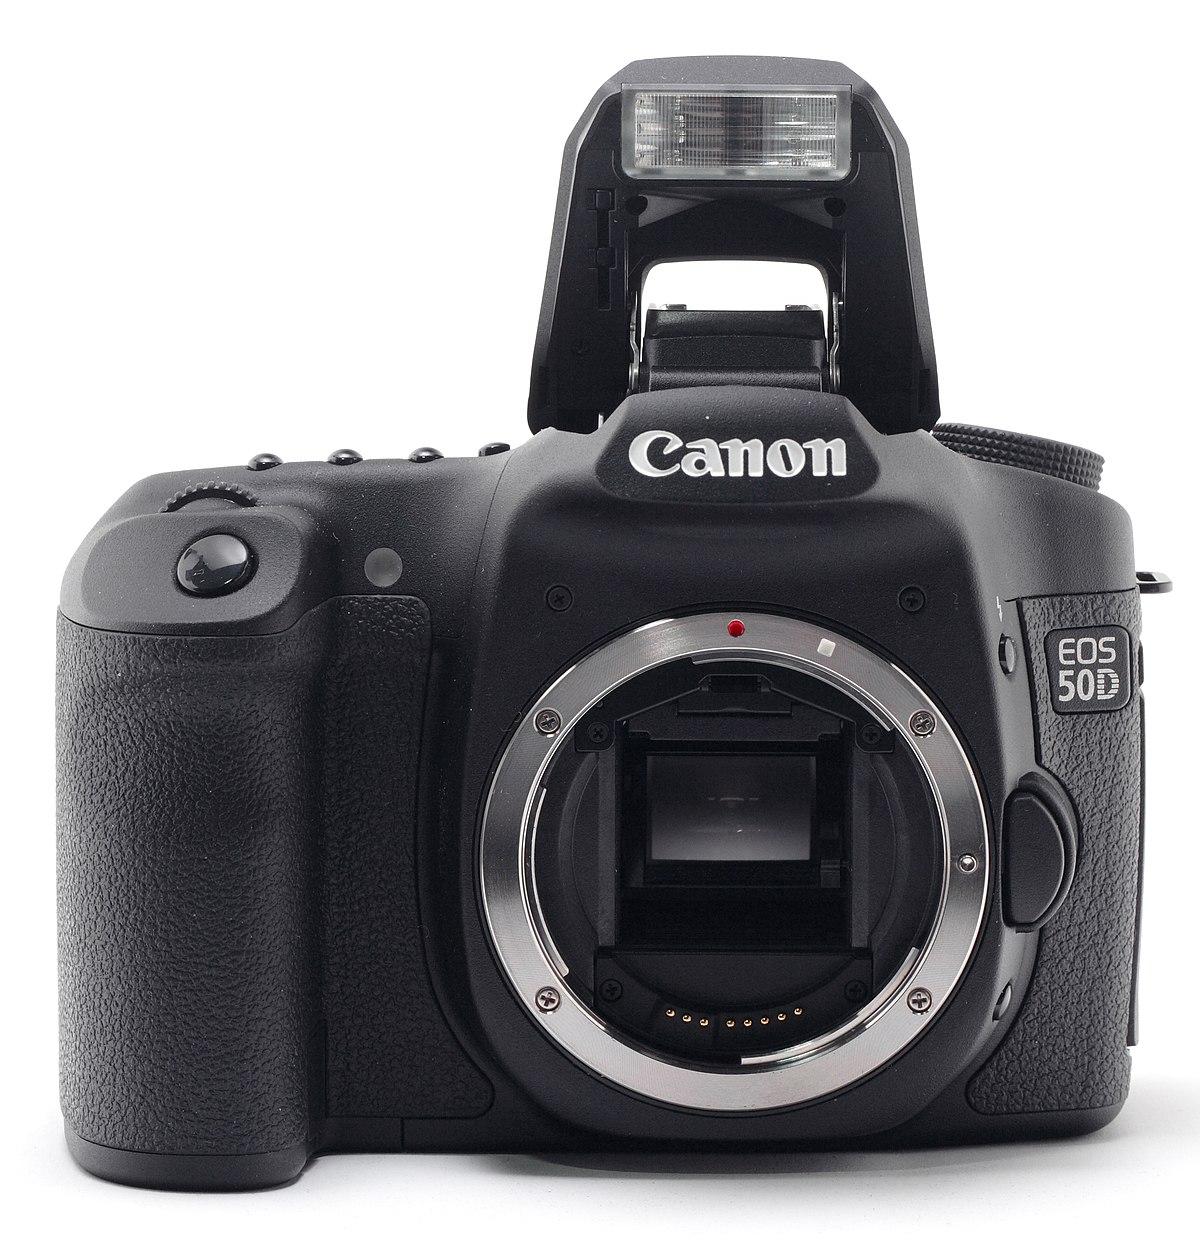 Canon EOS 50D - Wikipedia, la enciclopedia libre